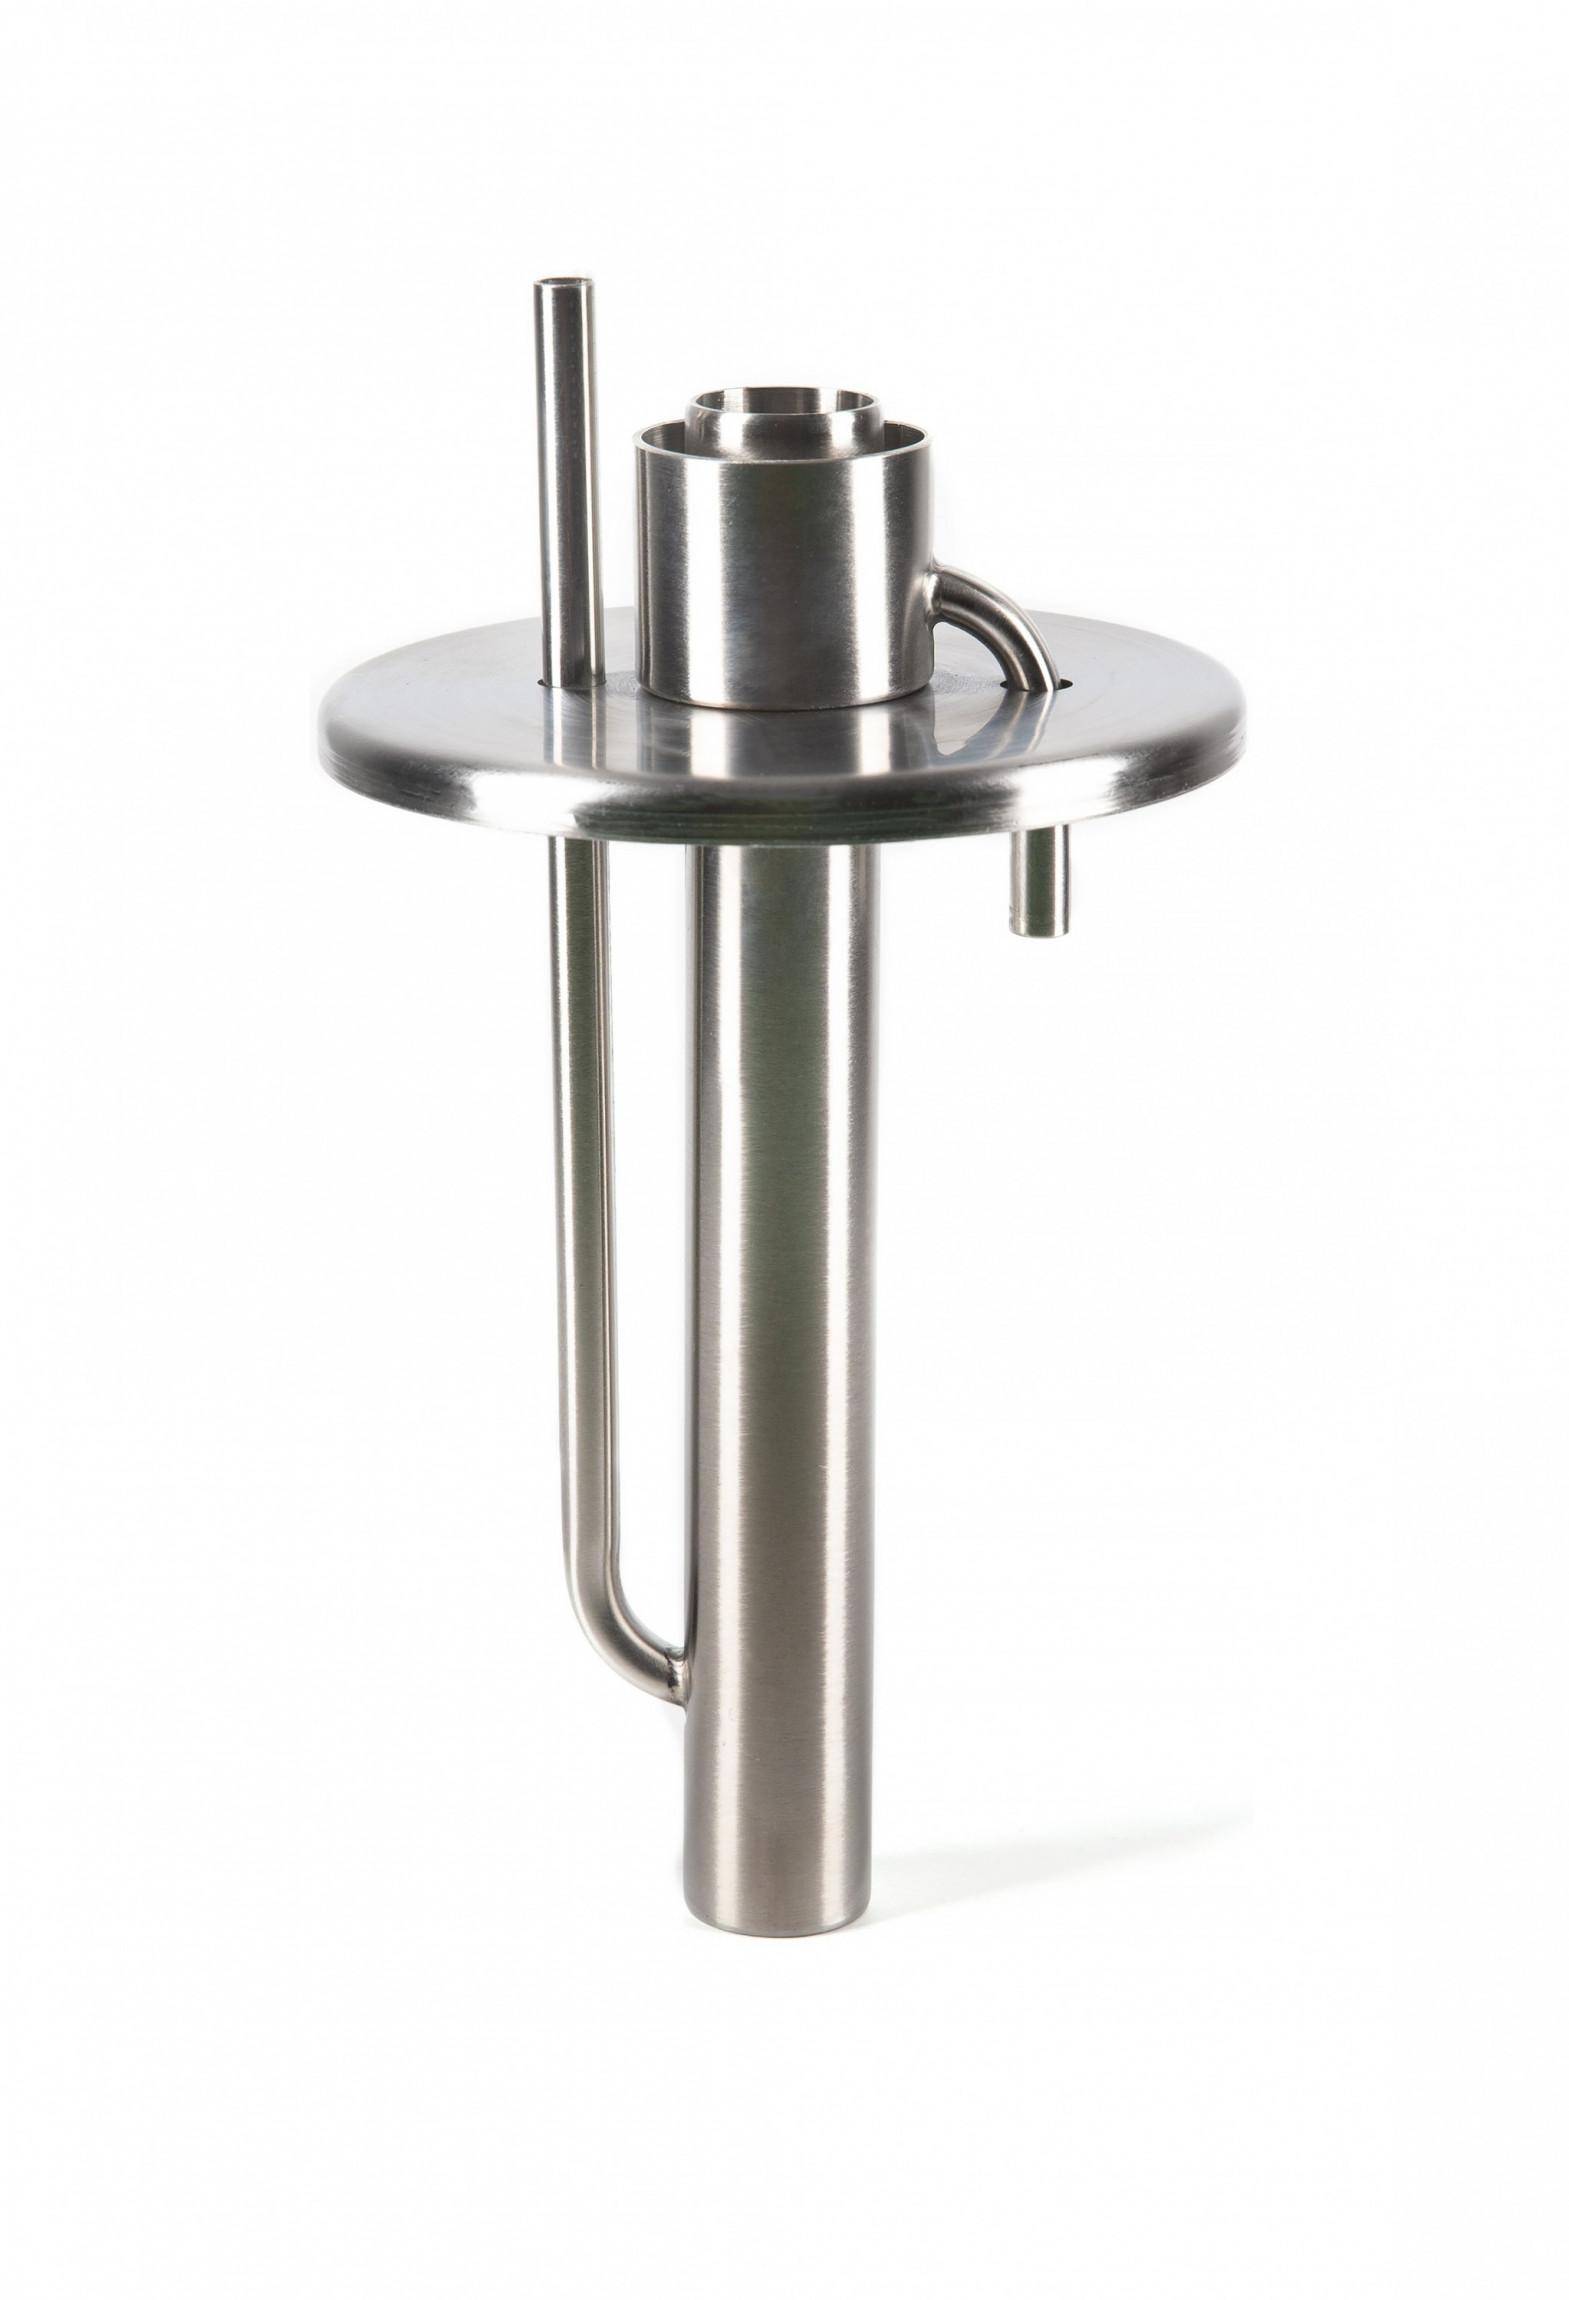 Stainless Steel Distiller's Parrot Ø114 mm